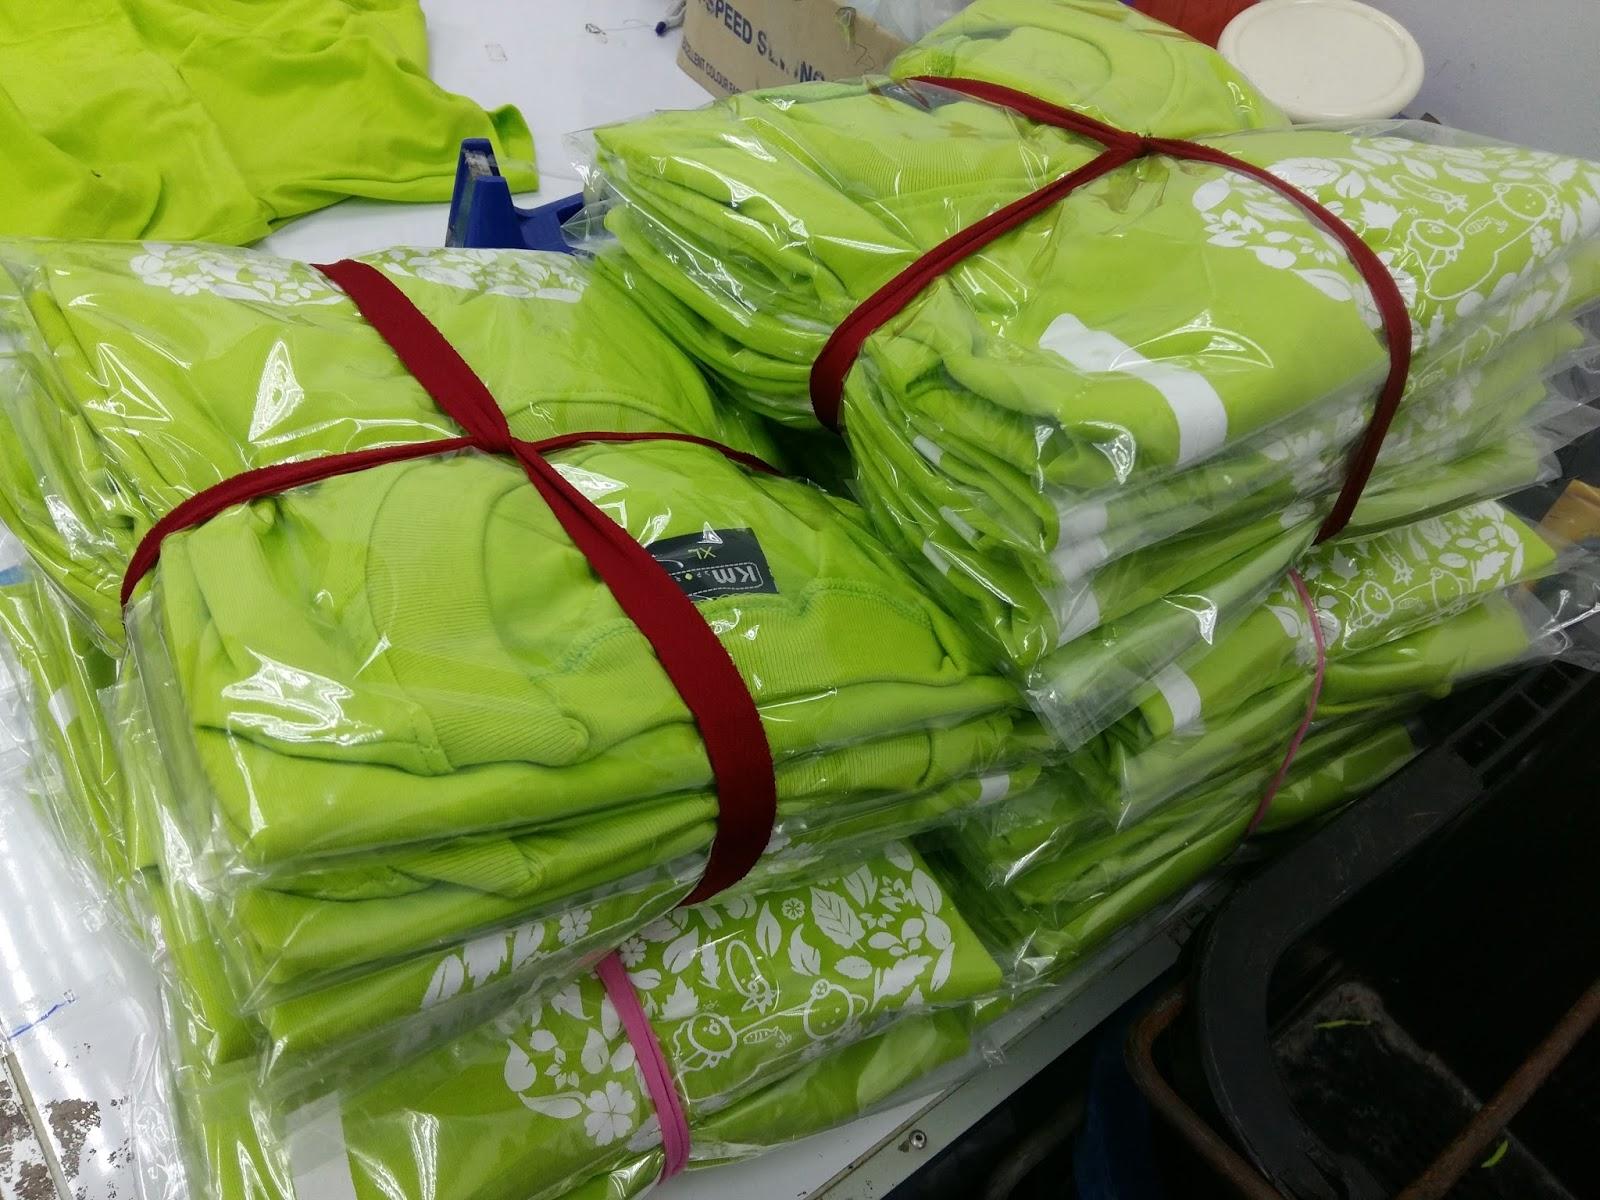 Design t shirt johor - Custom Made Ready Made Uniform Manufacturer Uniform Design Uniformsupplier In Johor Bahru Jb Malaysia Km Uniform Sdn Bhd As Known As Km Is An